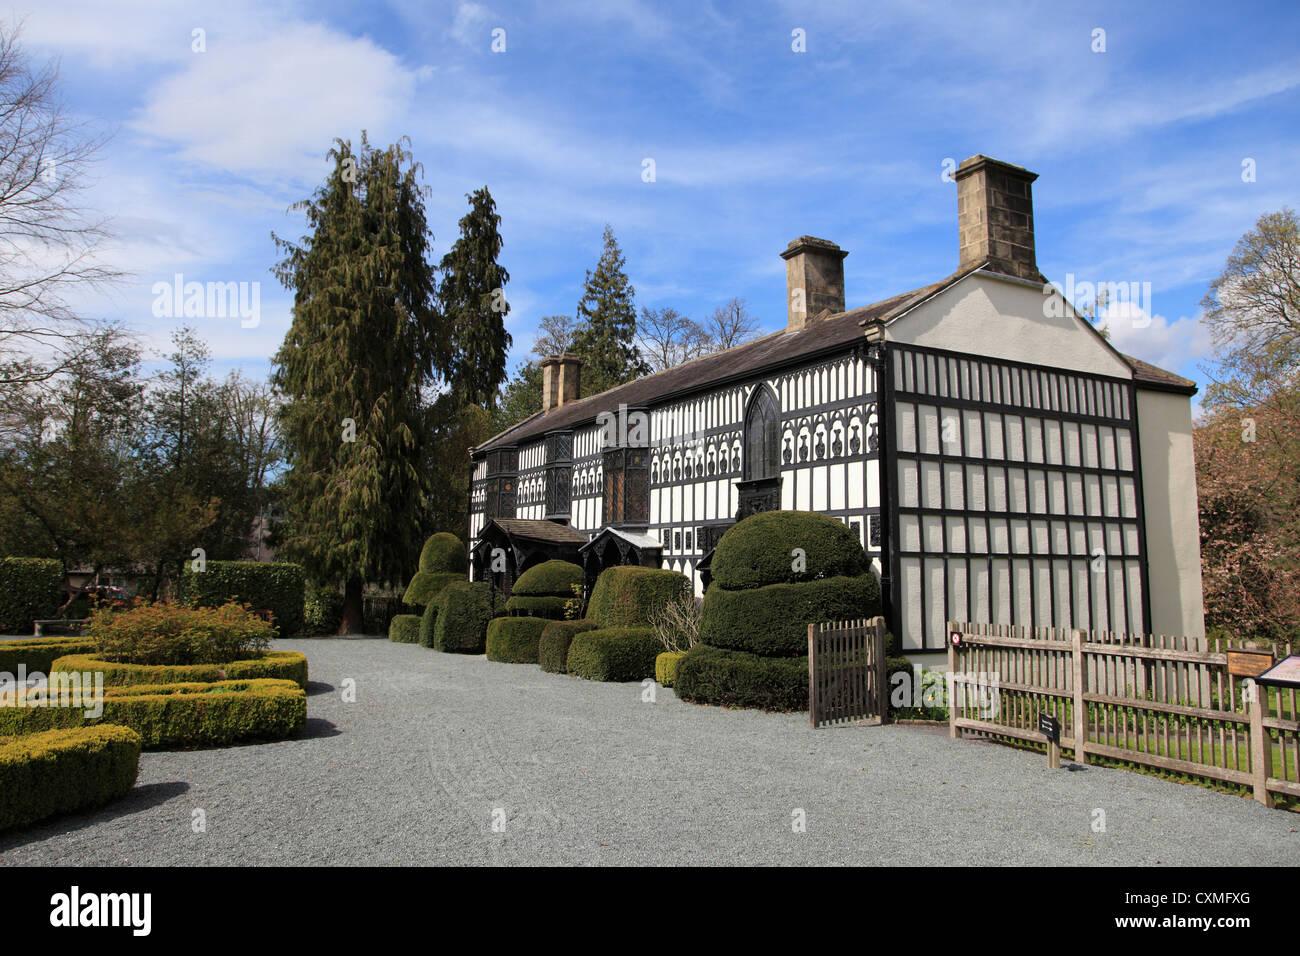 Plas Newydd, Museum, Llangollen, Dee Valley, Denbighshire, North Wales, Wales, United Kingdom Stock Photo